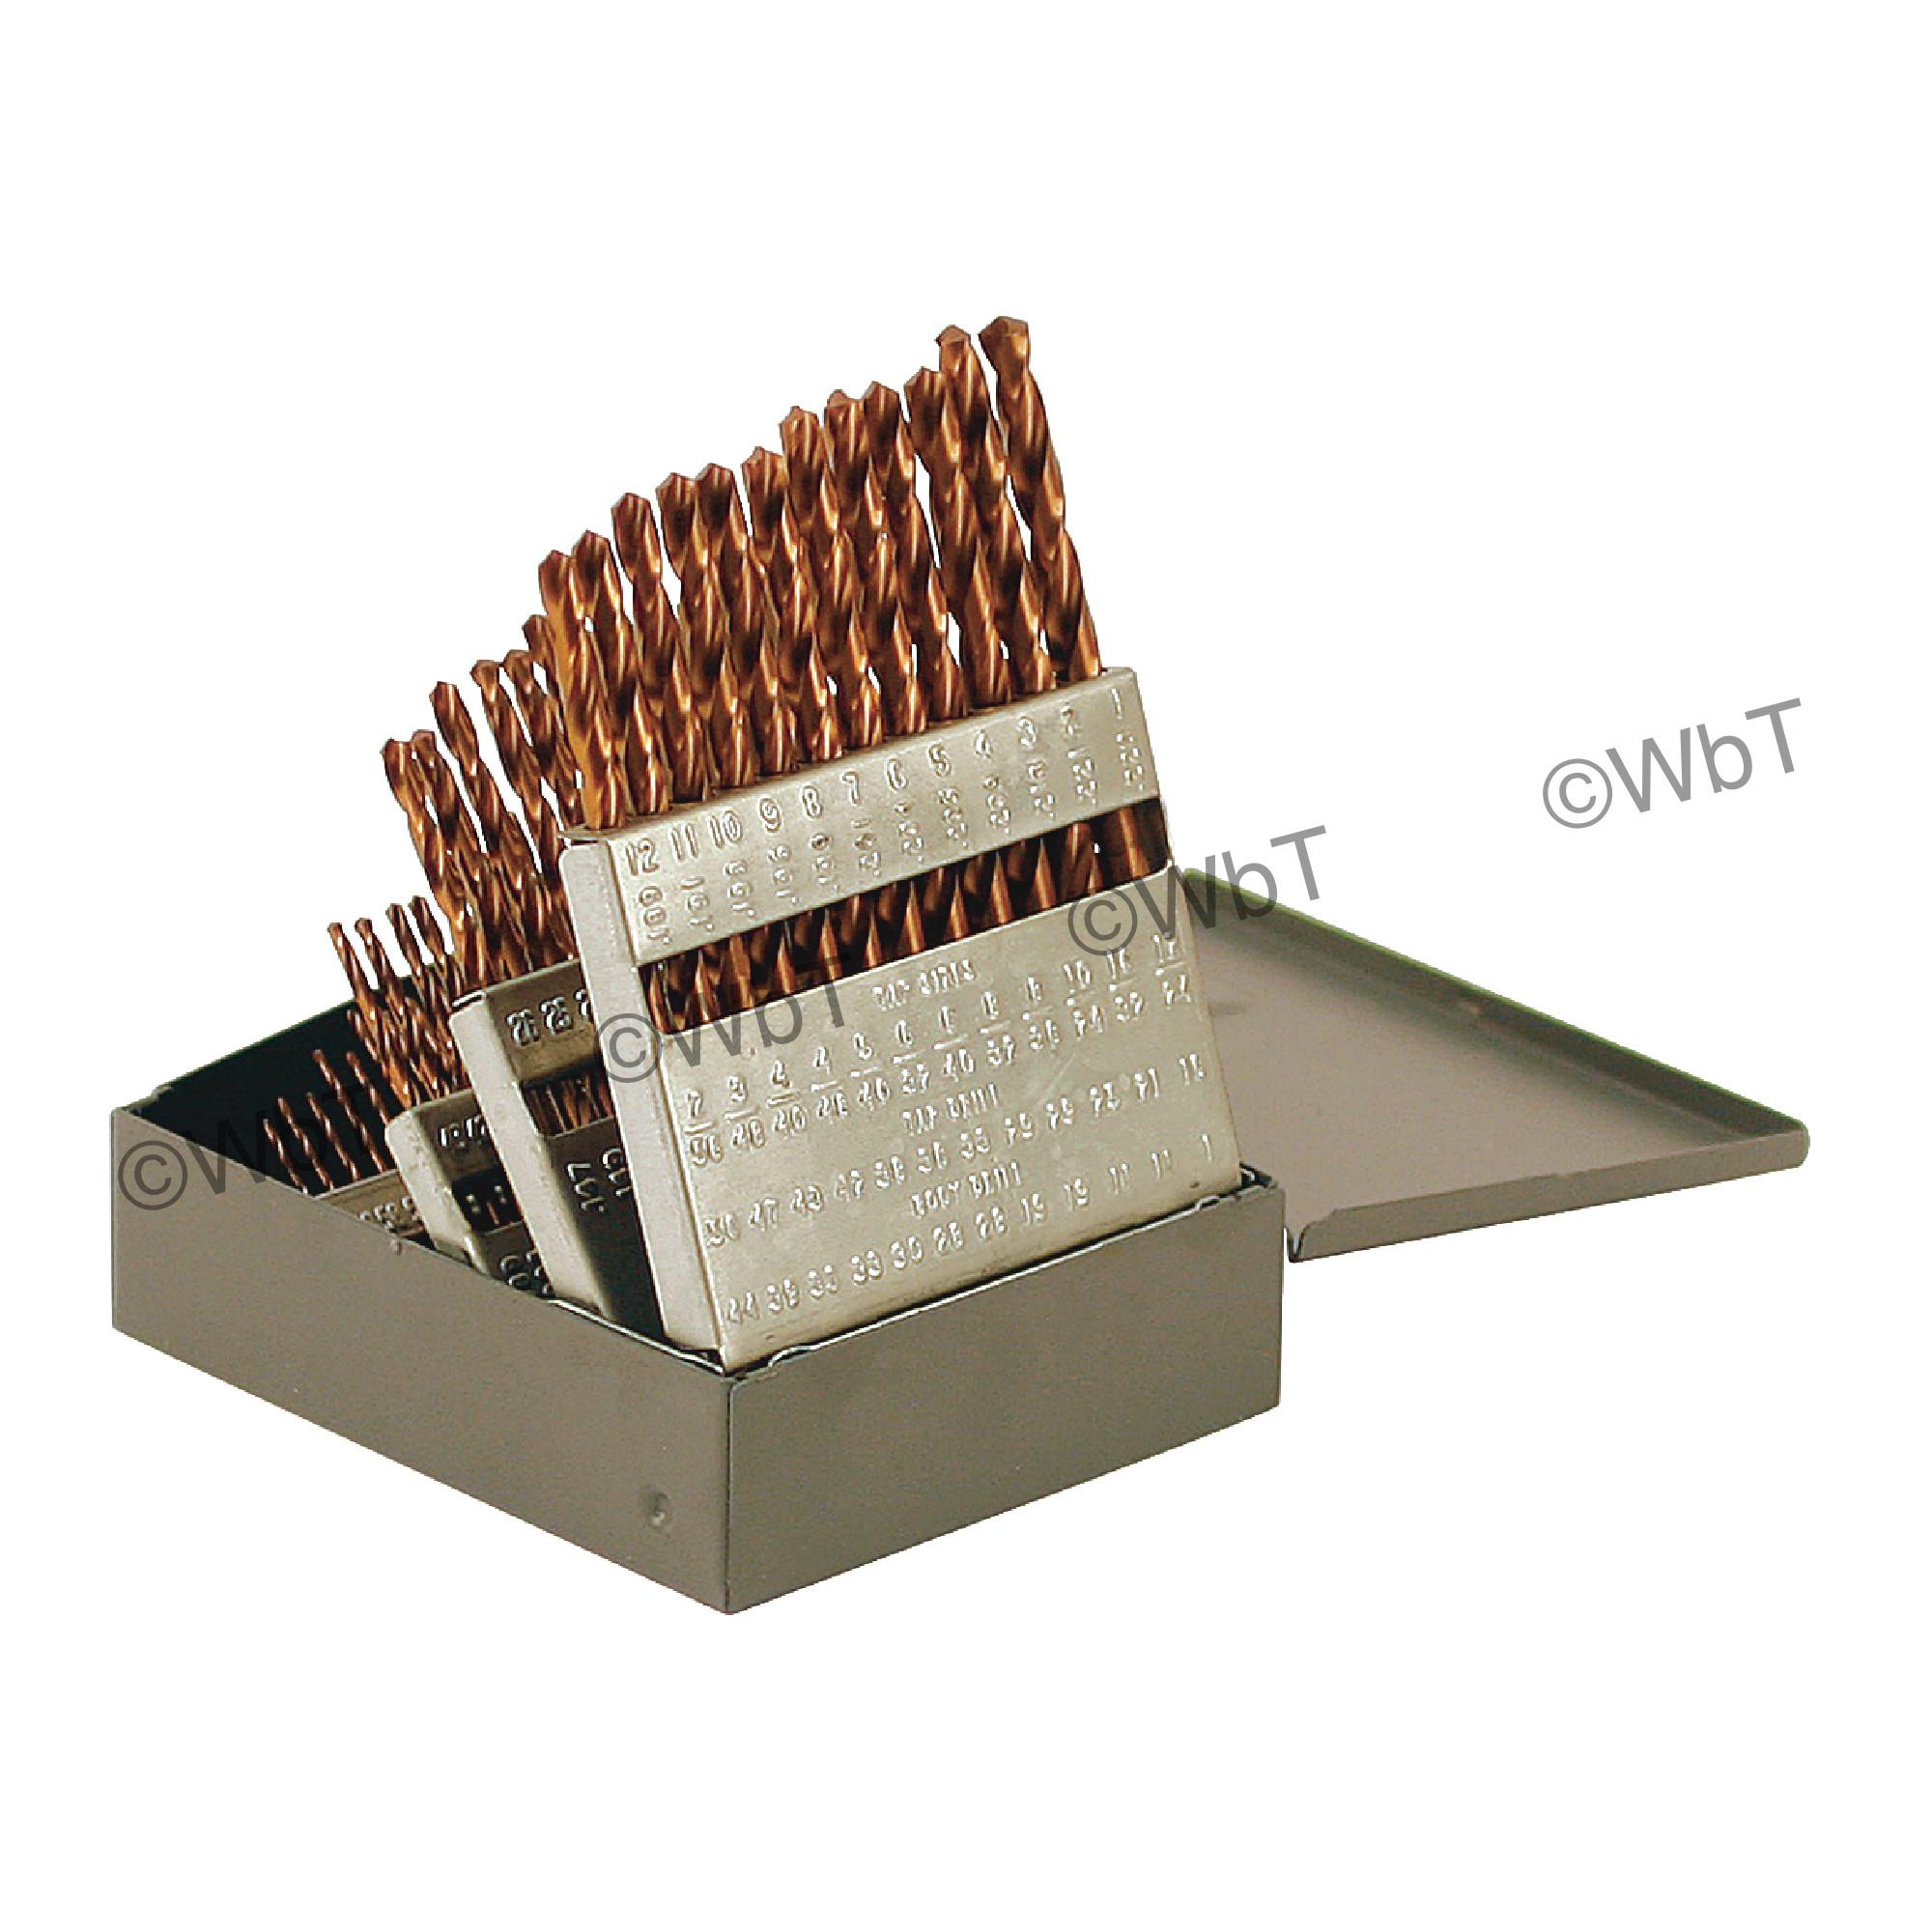 #1-60 Jobbers Length Twist Drill Set - TICN Coated